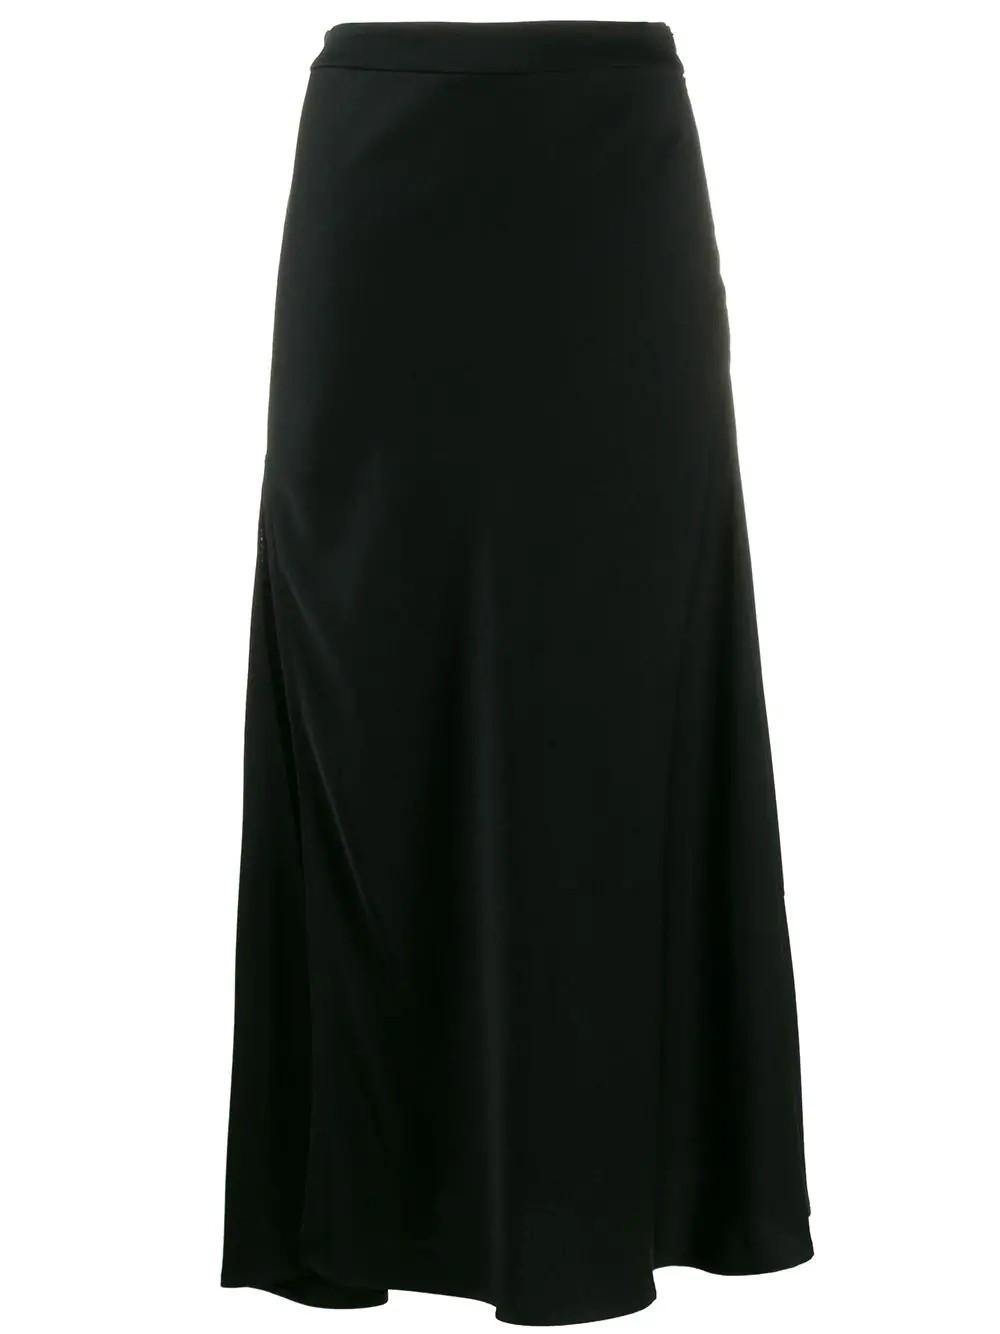 Suite One Bias High Slit Skirt